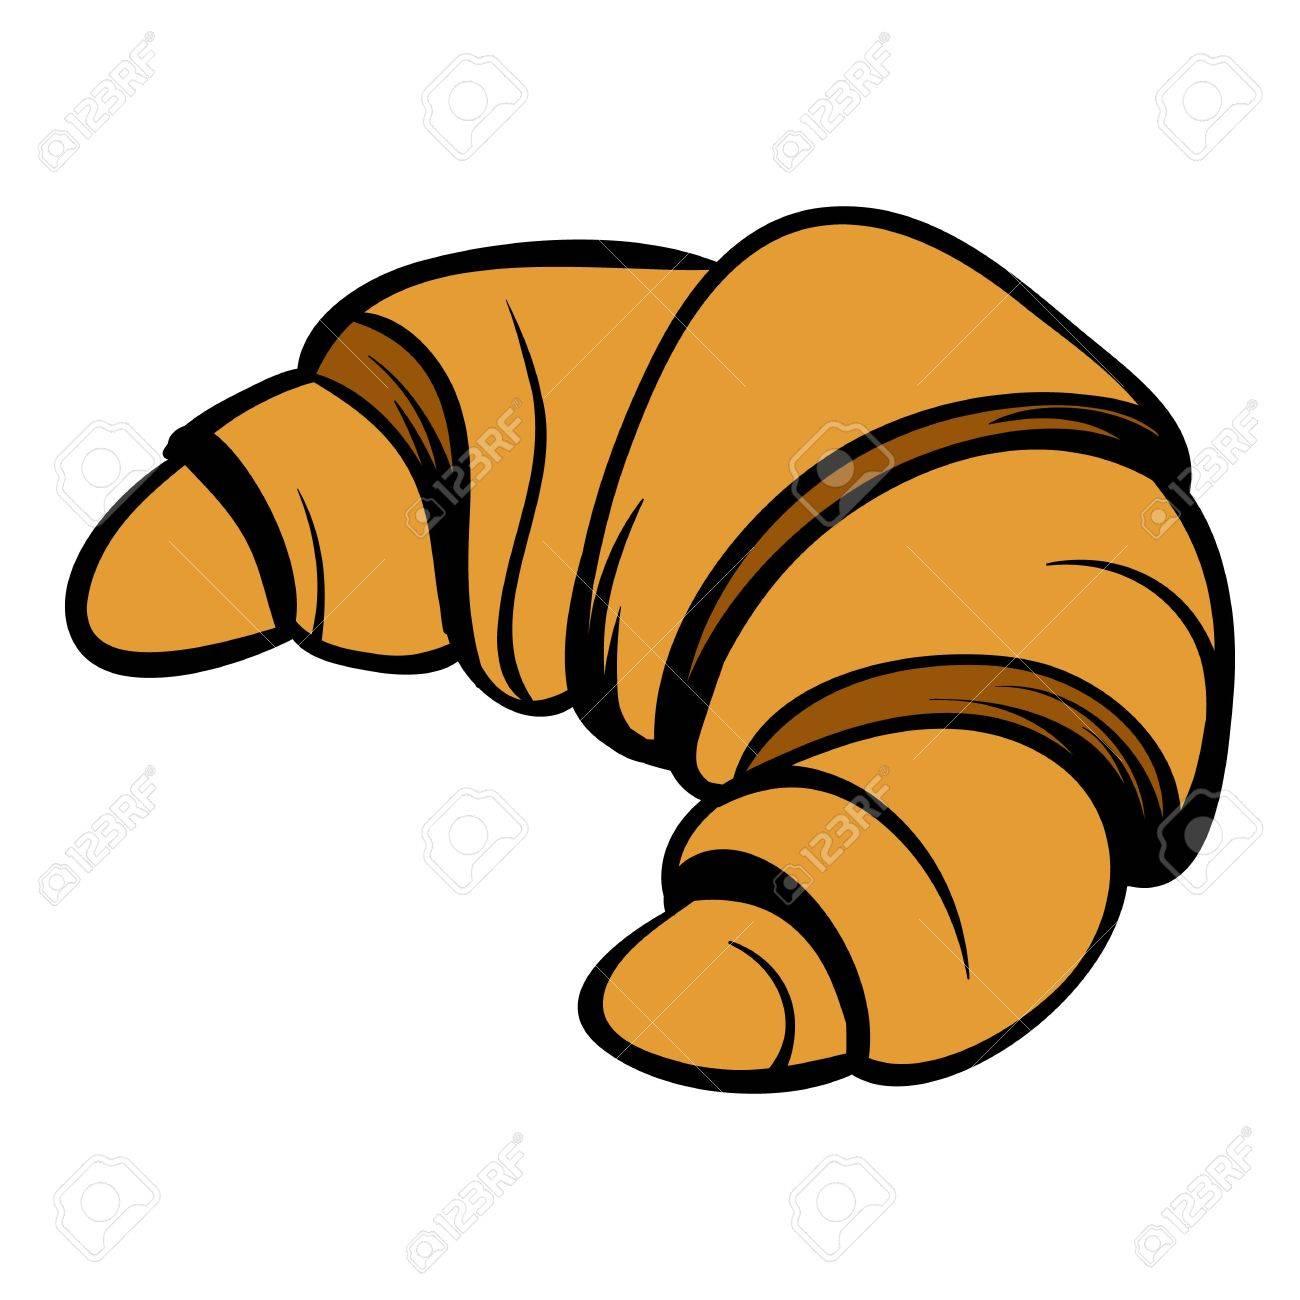 Croissant icon cartoon.